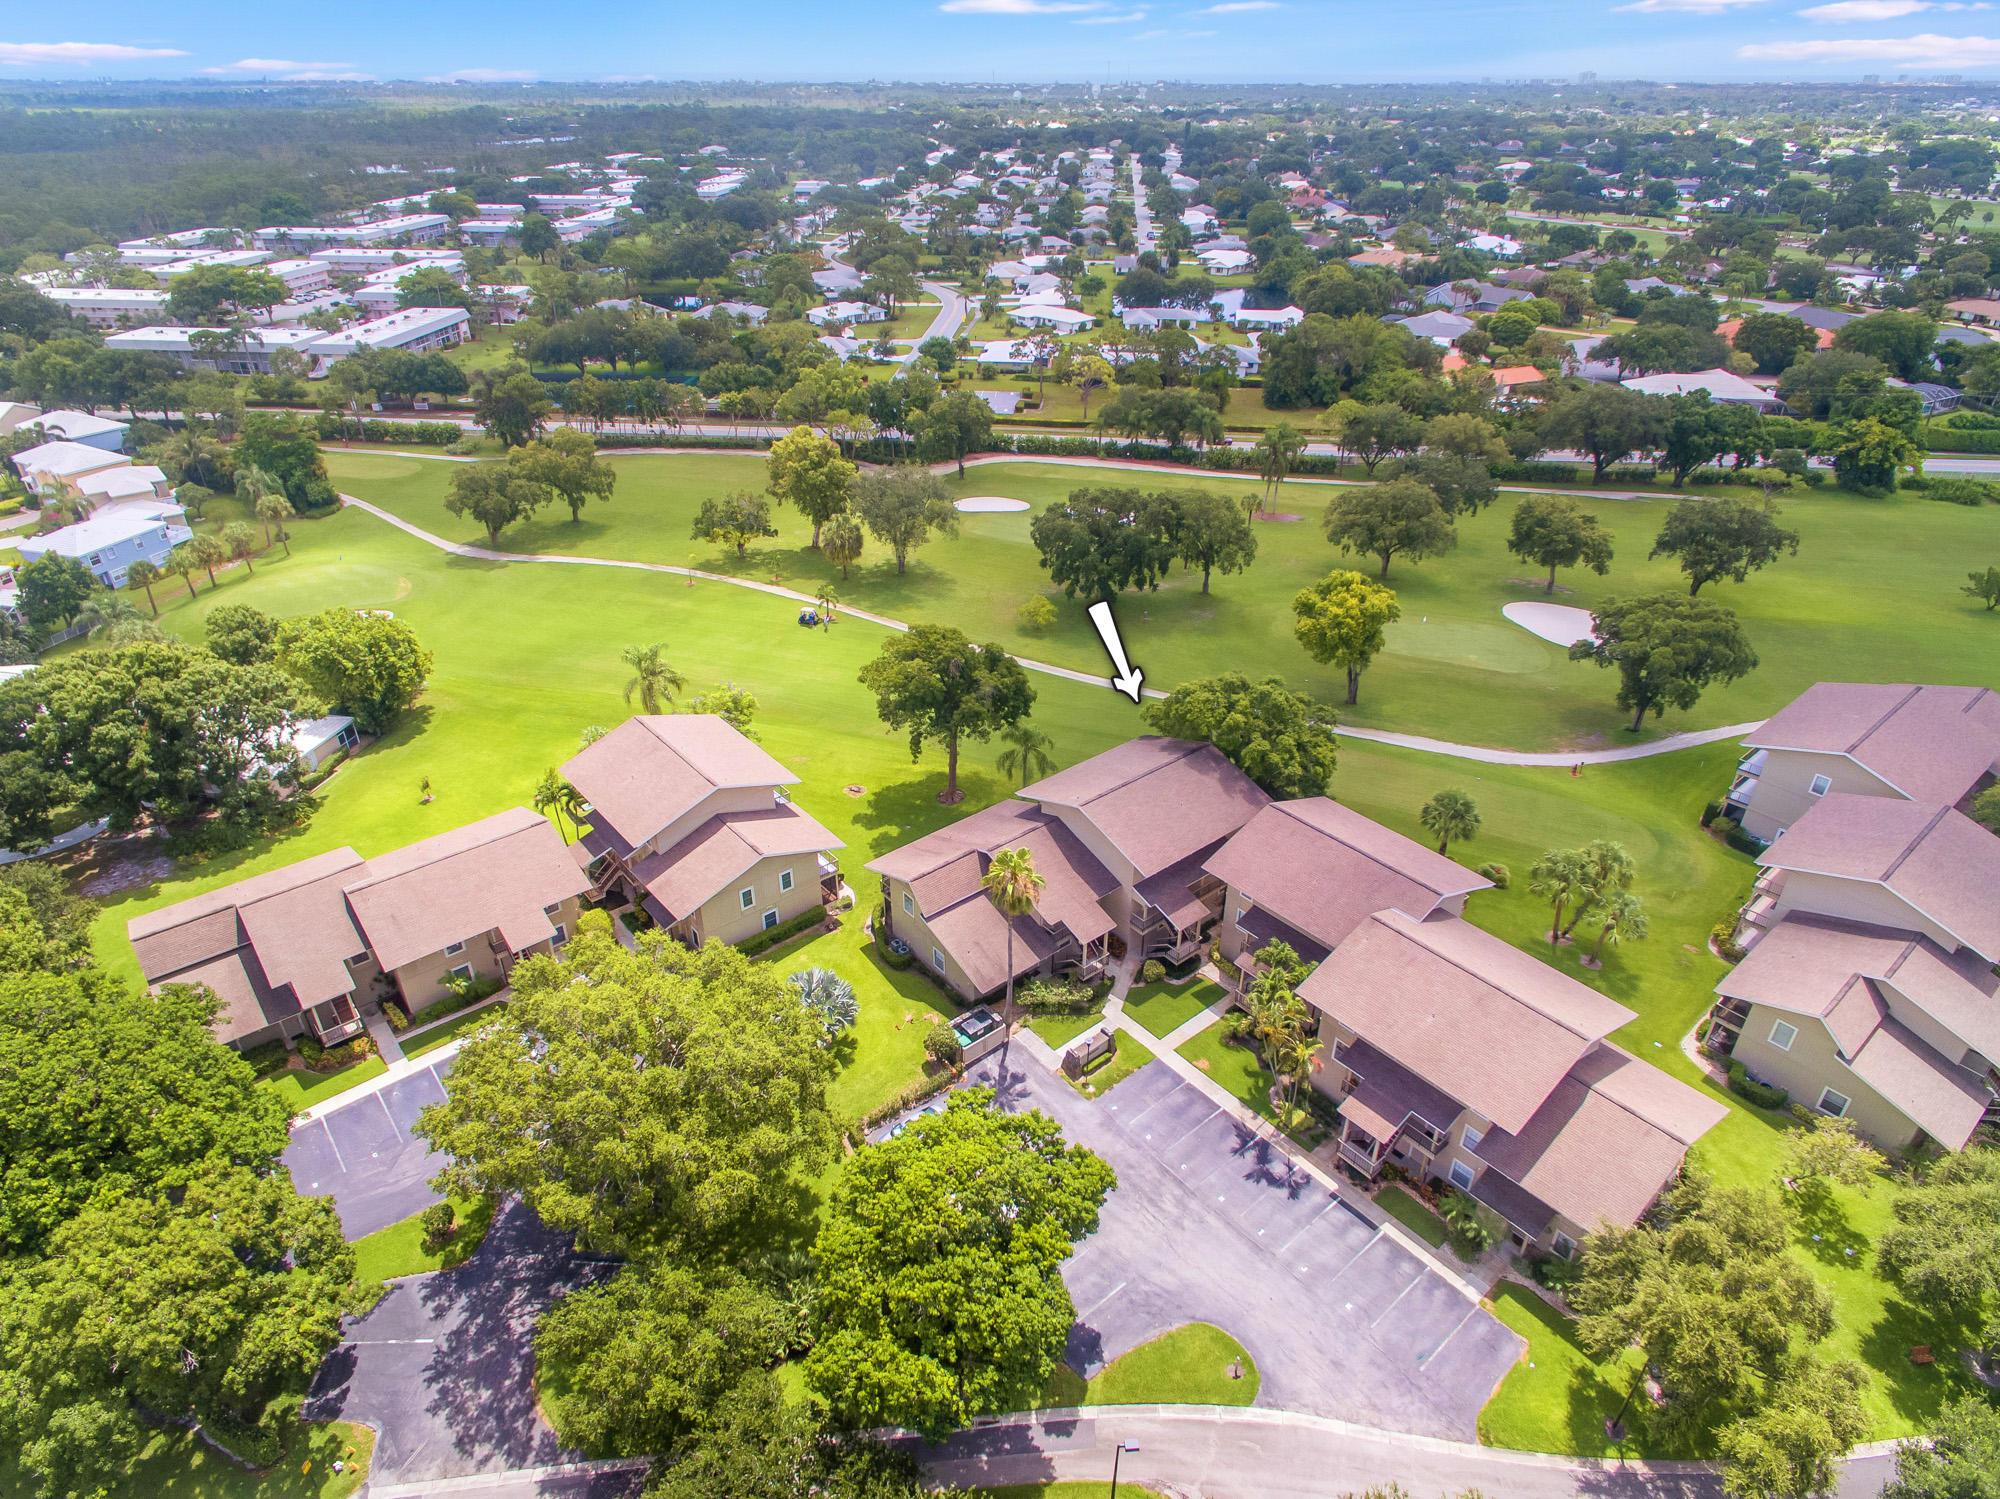 18369 Wood Haven Lane D, Tequesta, Florida 33469, 2 Bedrooms Bedrooms, ,2.1 BathroomsBathrooms,A,Condominium,Wood Haven,RX-10616506